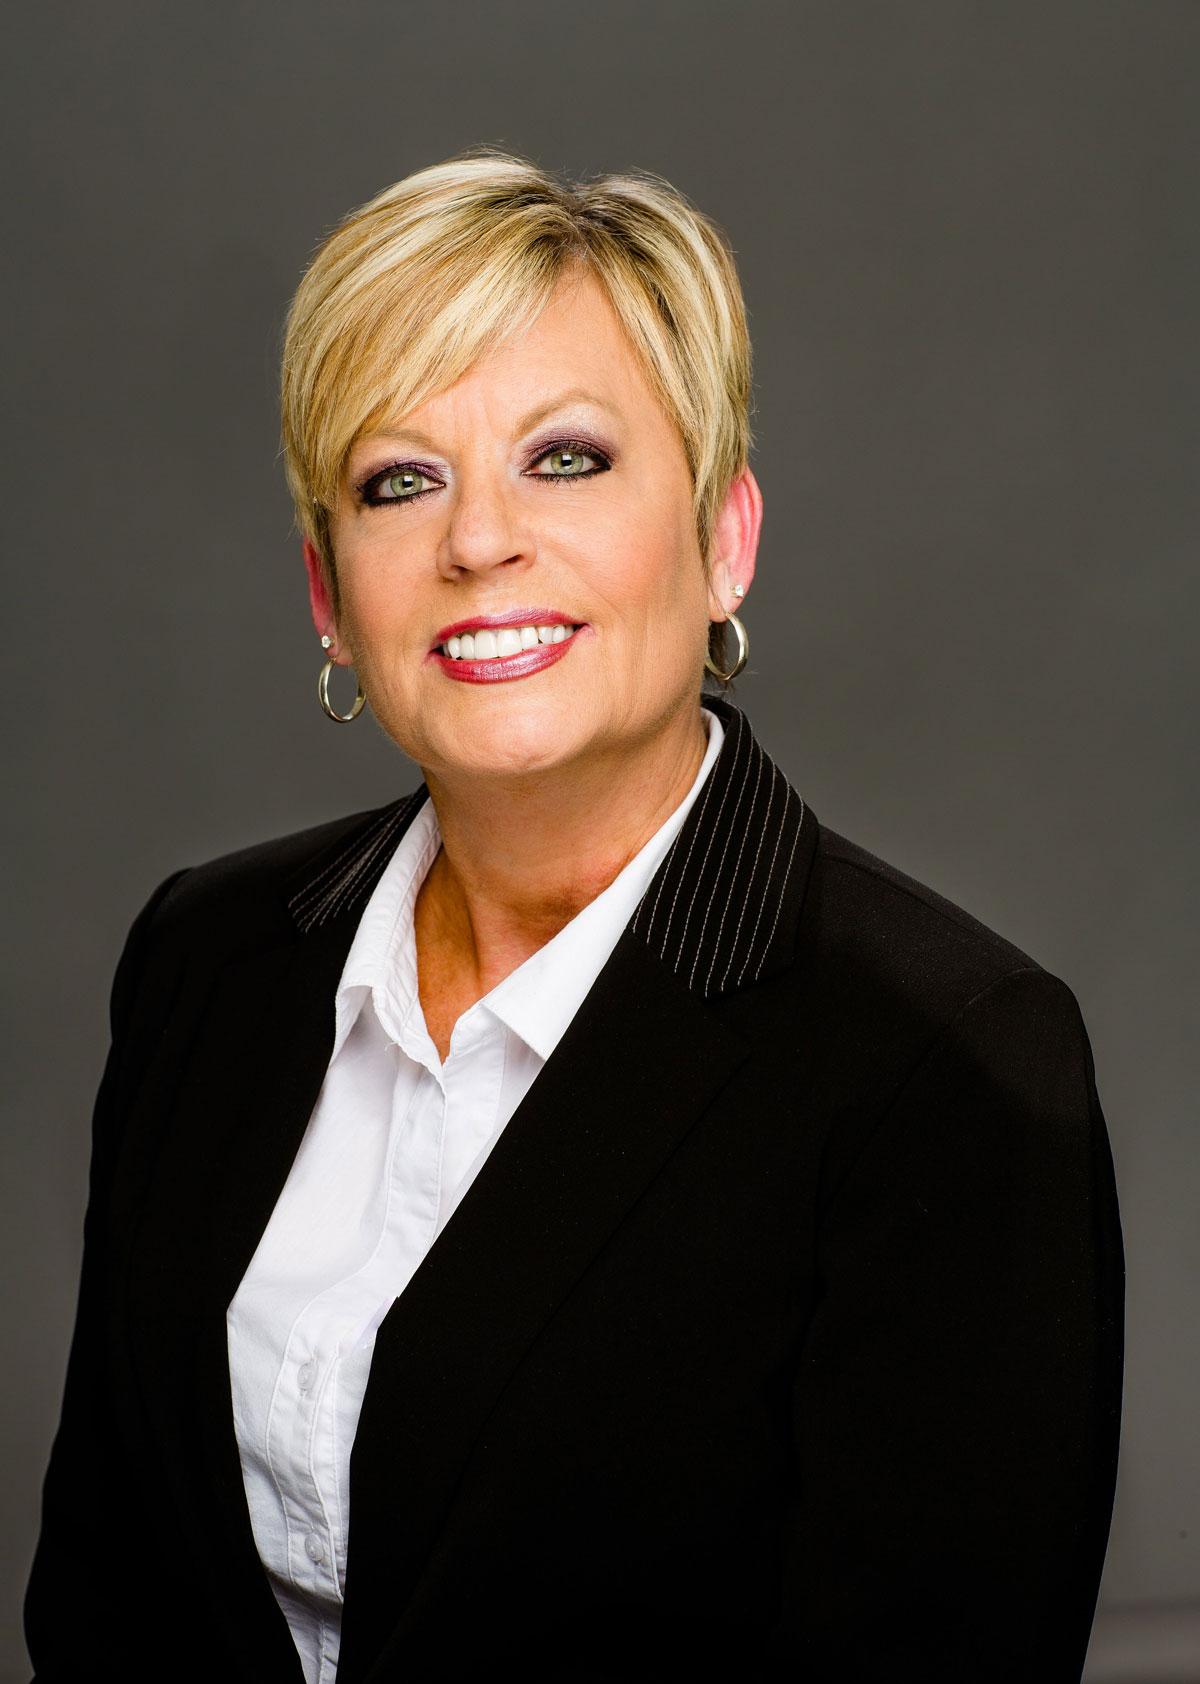 Marcie Woytus St. Louis personal injury lawyer